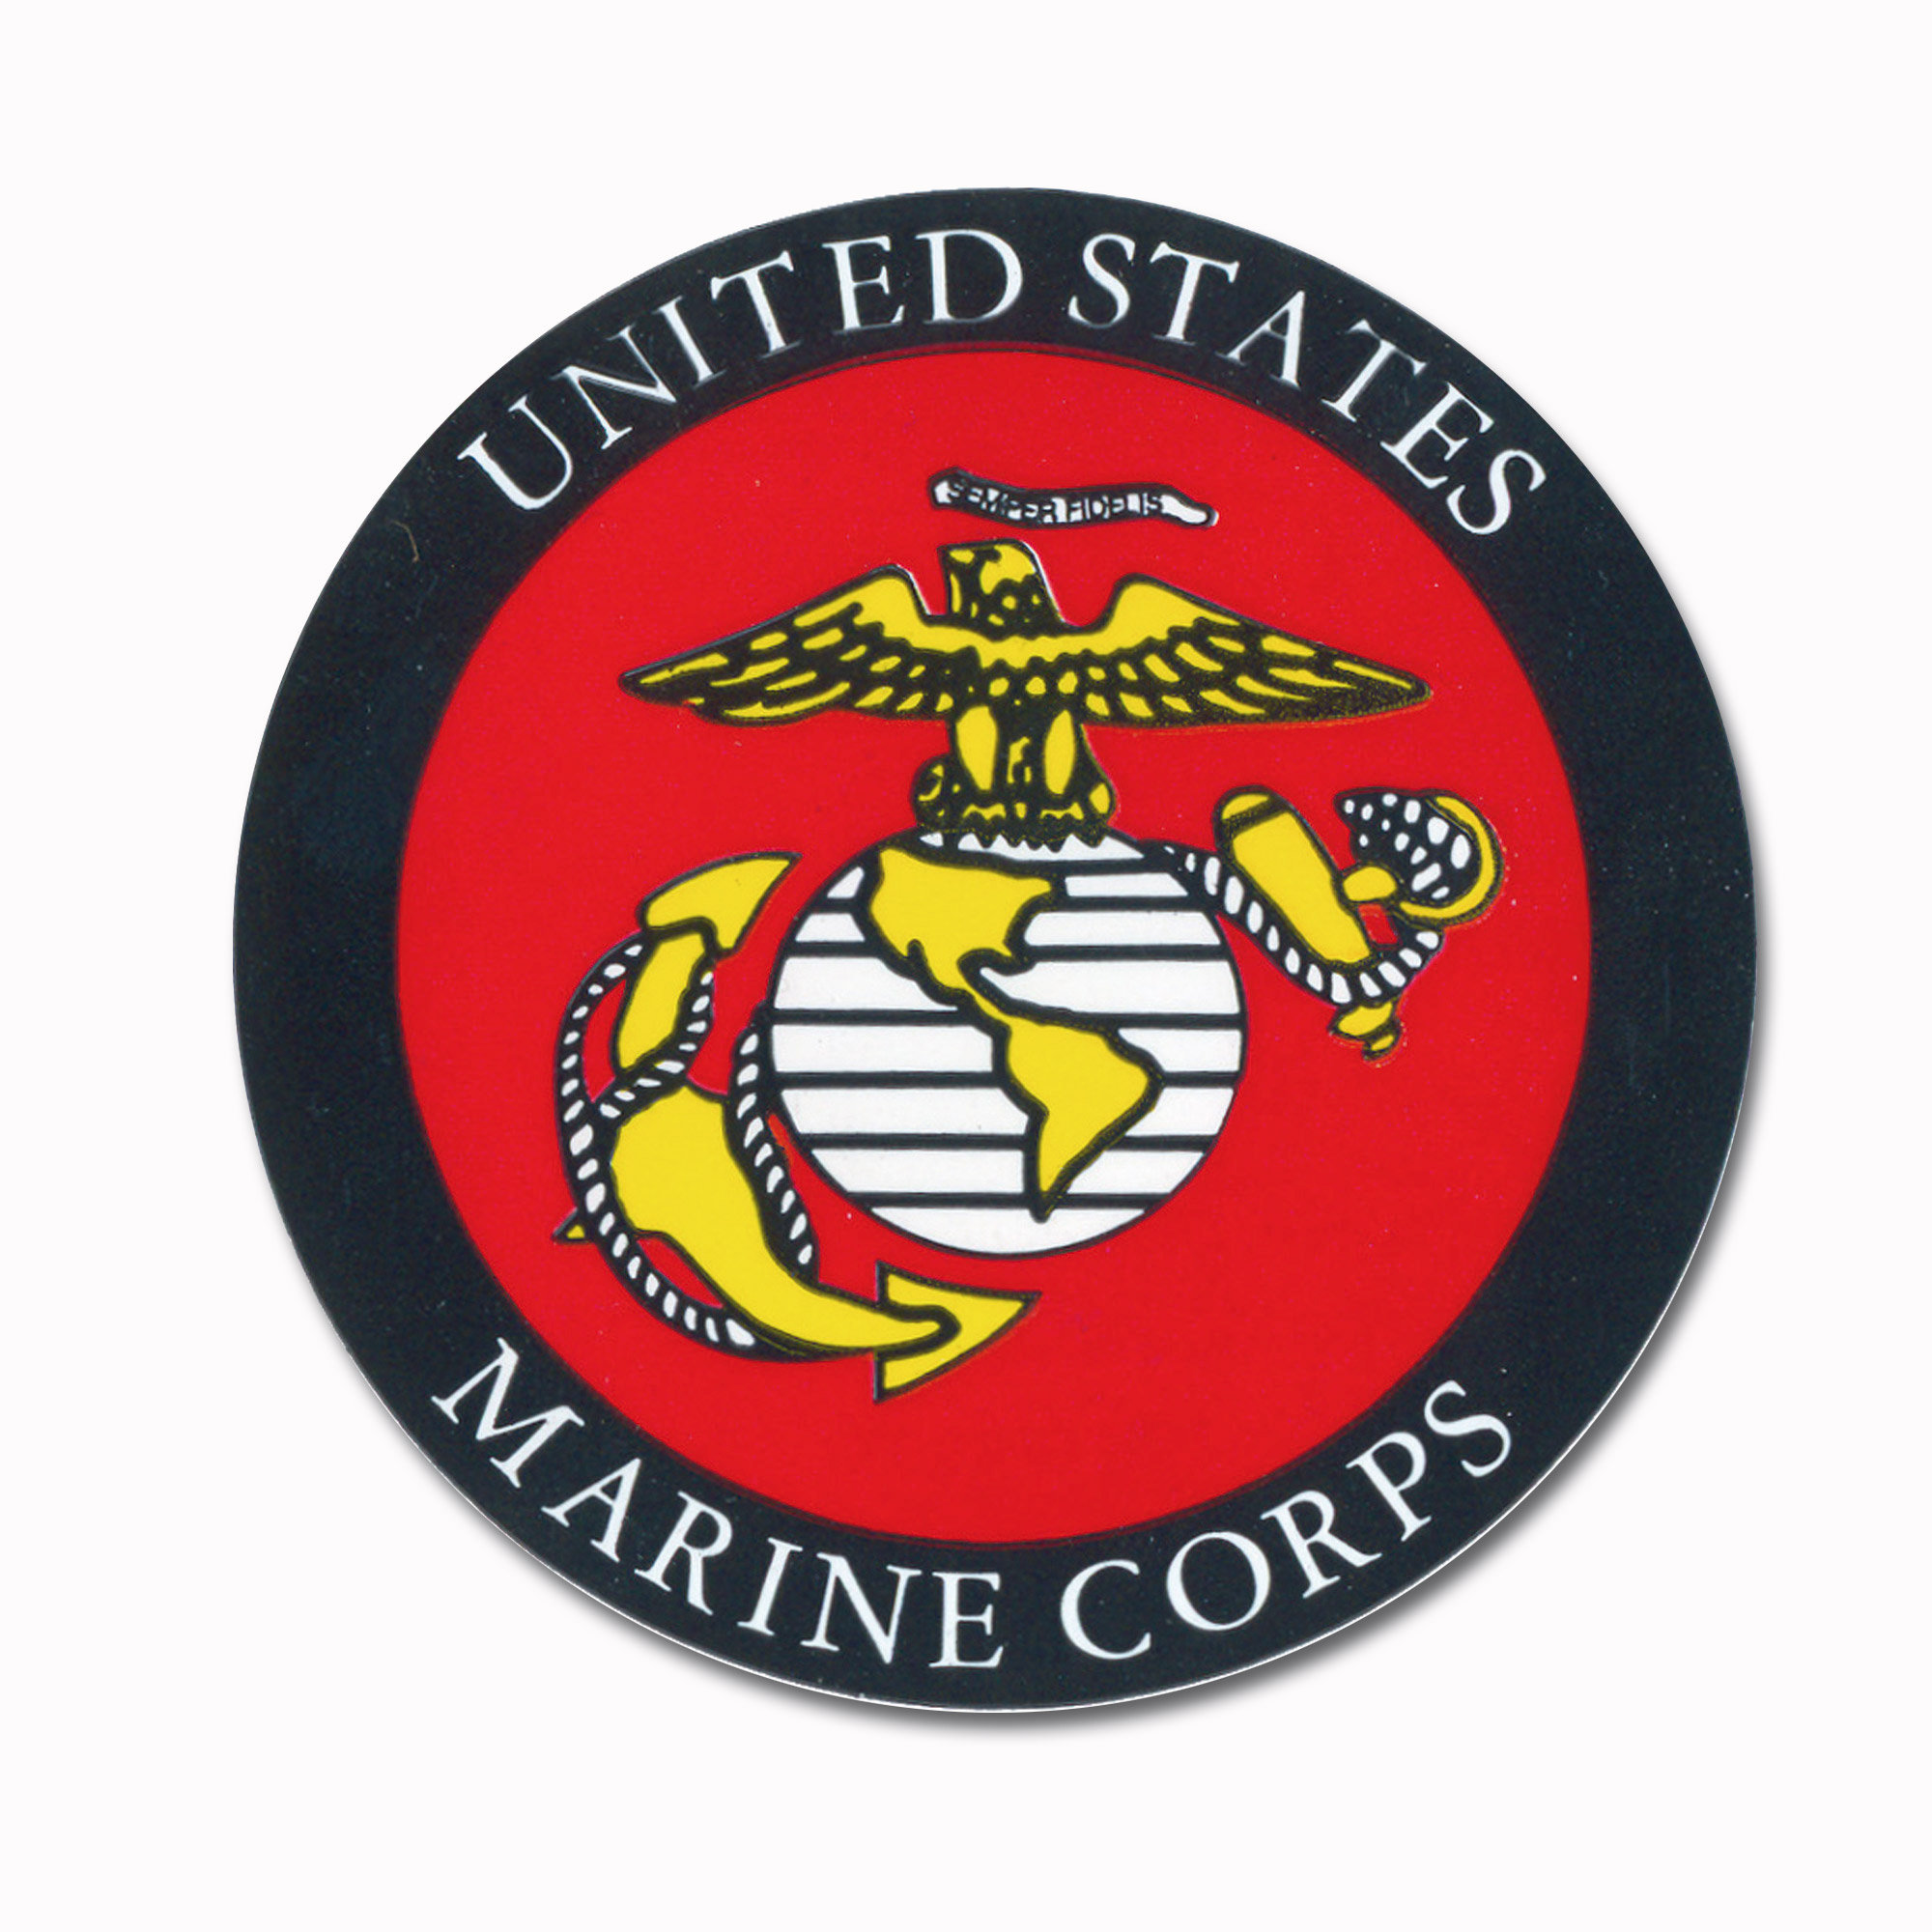 Autocollant Marine Corps rond